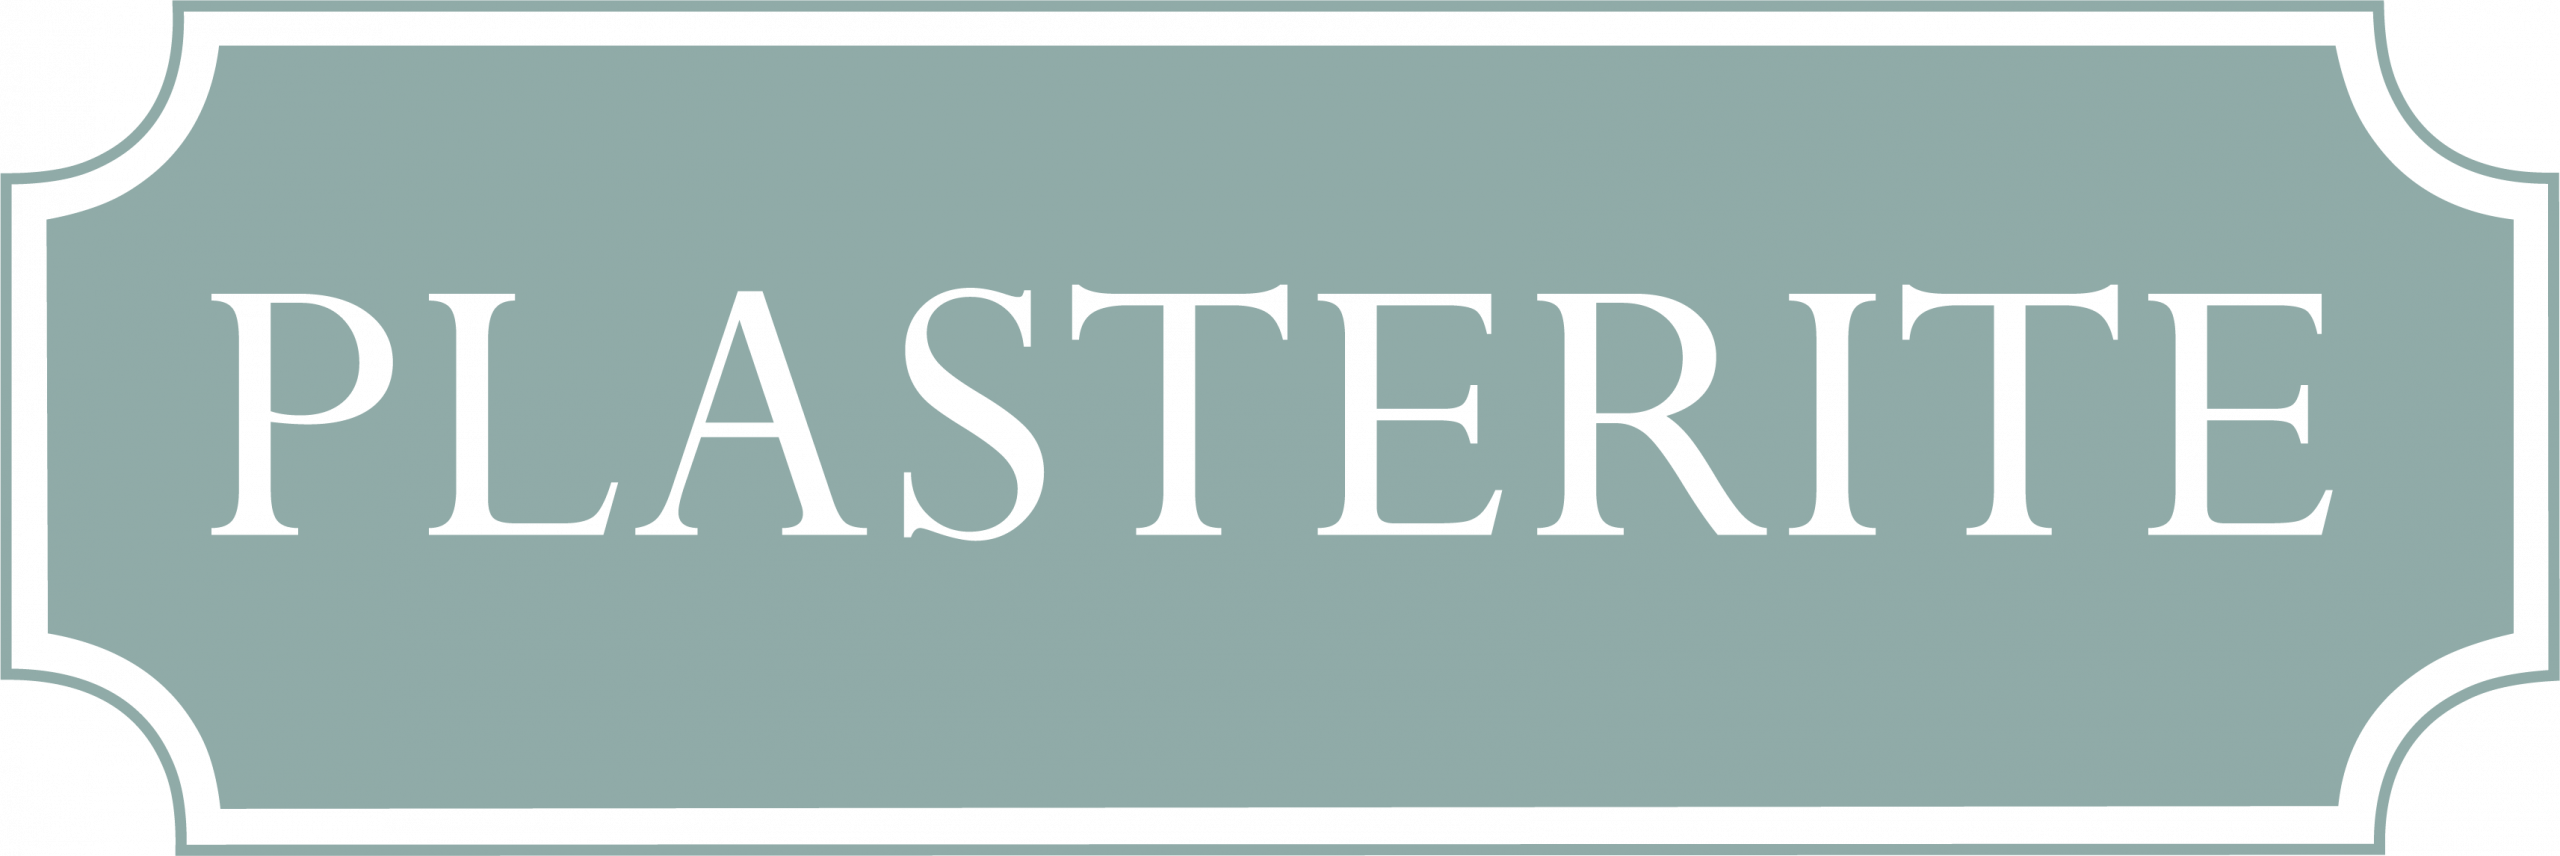 Plasterite Mouldings company logo